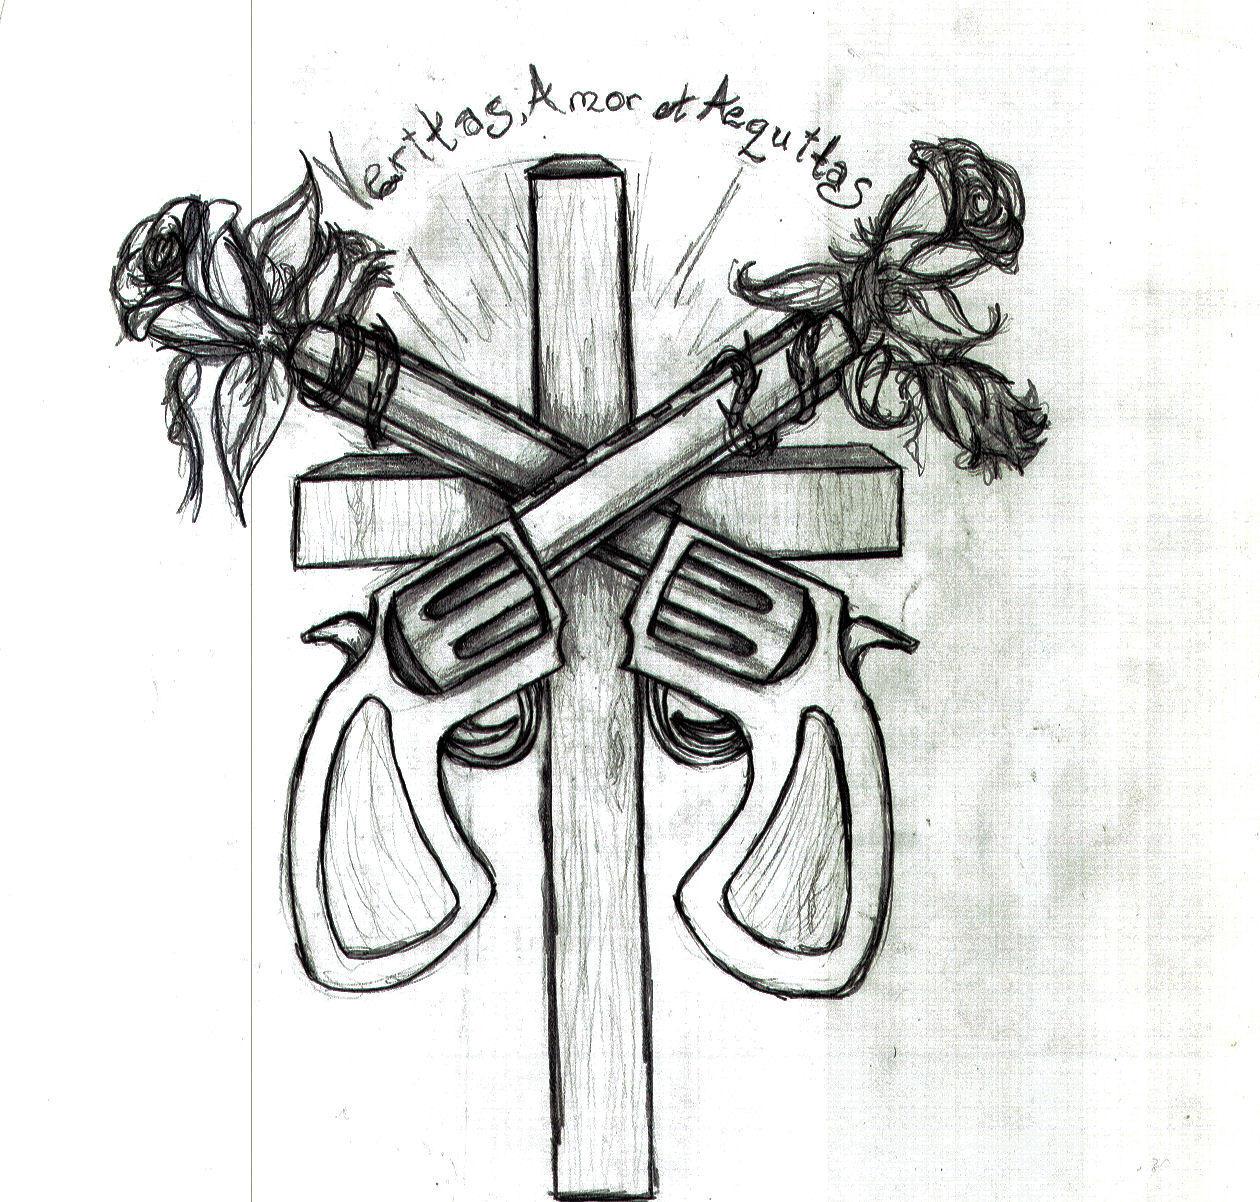 Veritas amor et aequitas by keeleehamomin8788 on deviantart for Veritas aequitas tattoos